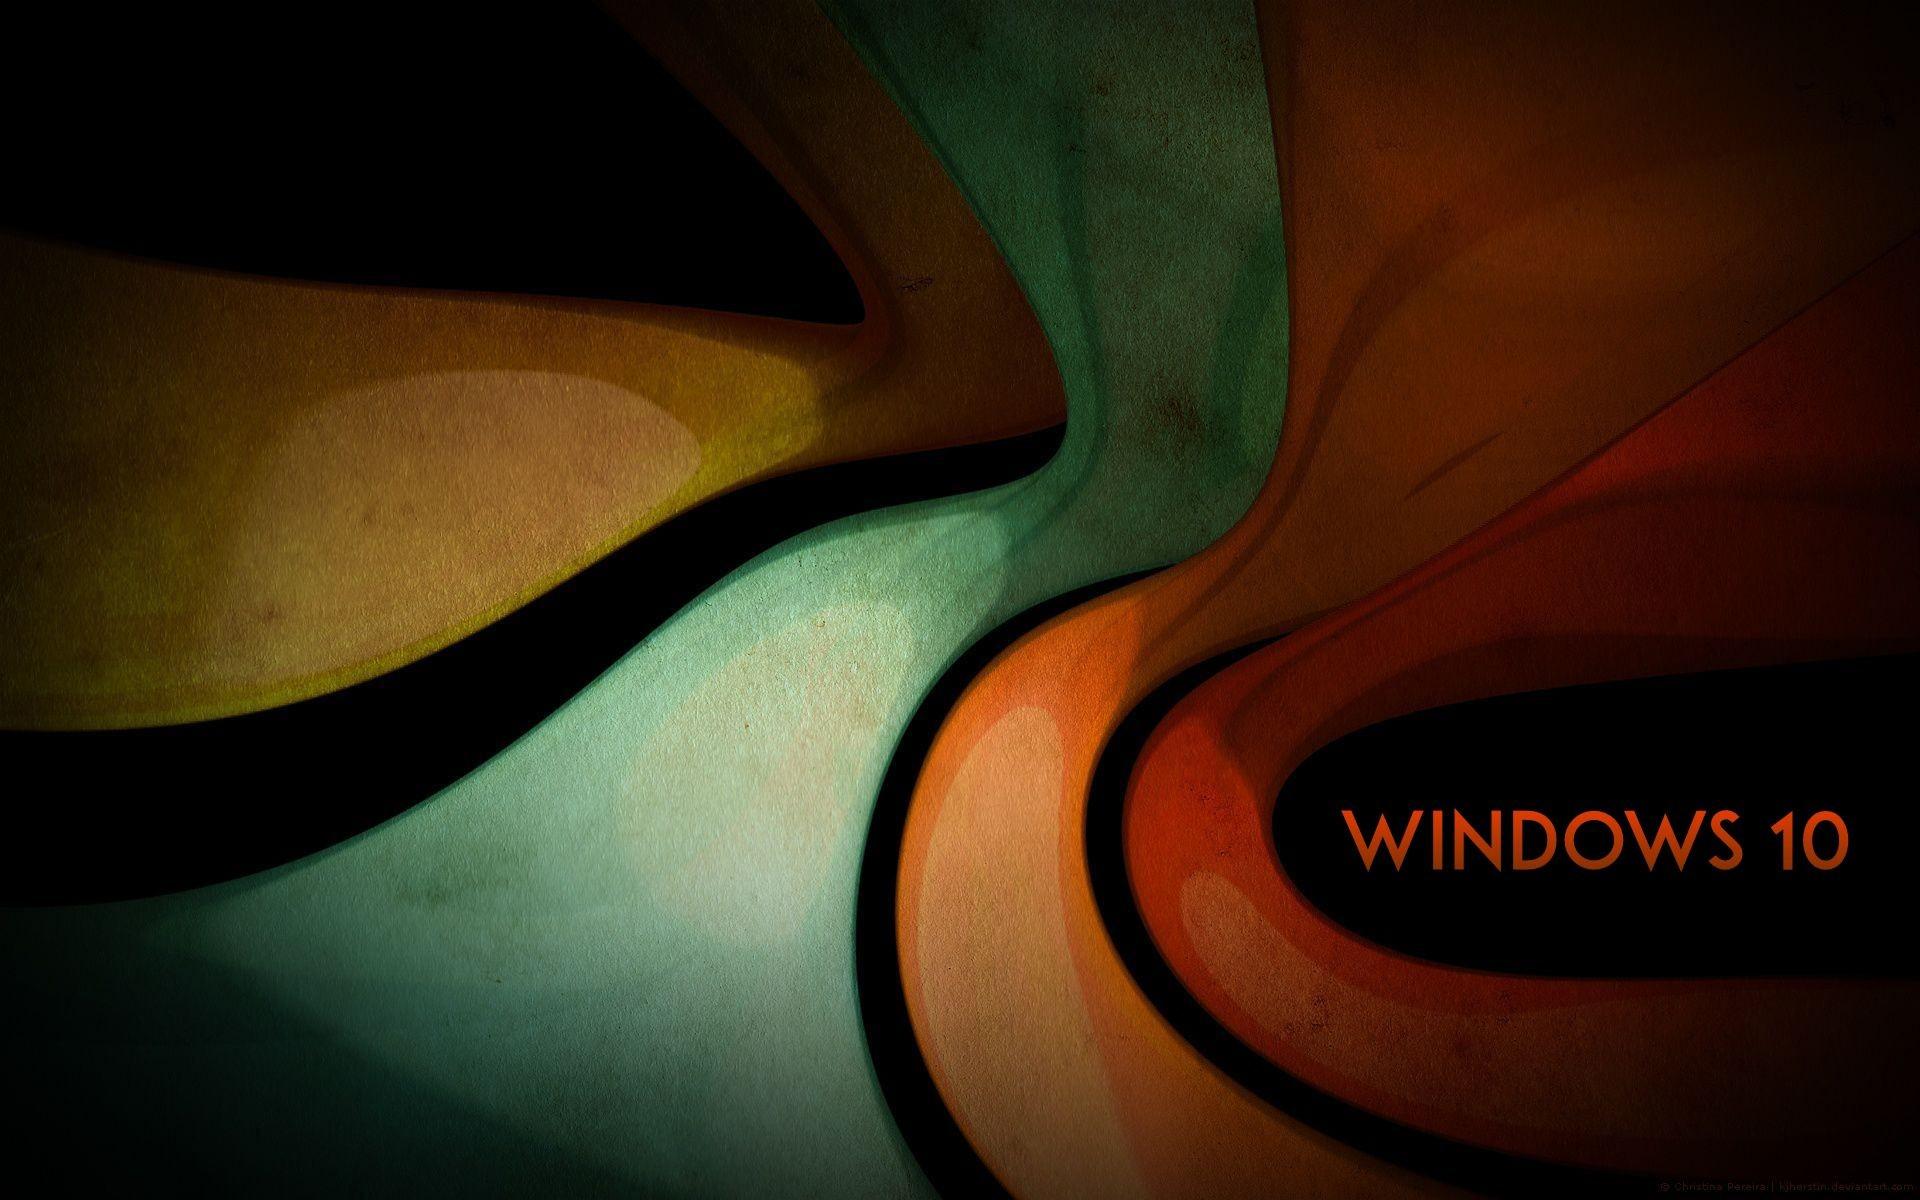 ThinkPad Wallpaper Windows 7 – WallpaperSafari